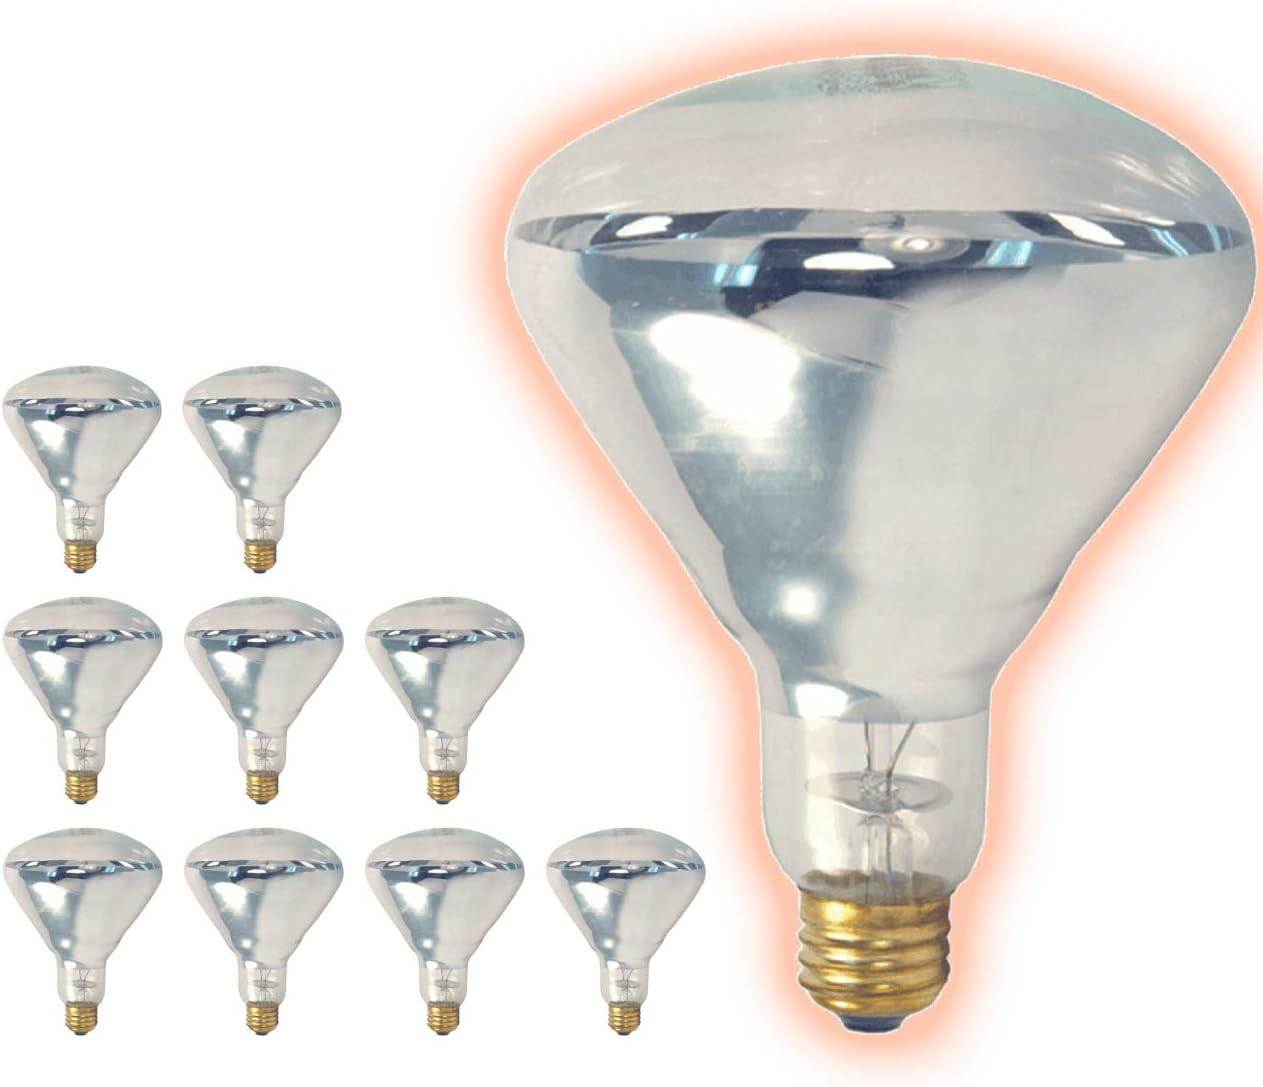 25O Watt Heat Lamp BR40 Light Bulbs | Incandescent Restaurant Bulb with E26 Medium Base | 2700K Warm White 3250 Lumens | Restaurant Light Bulbs | 10 Pack by GoodBulb